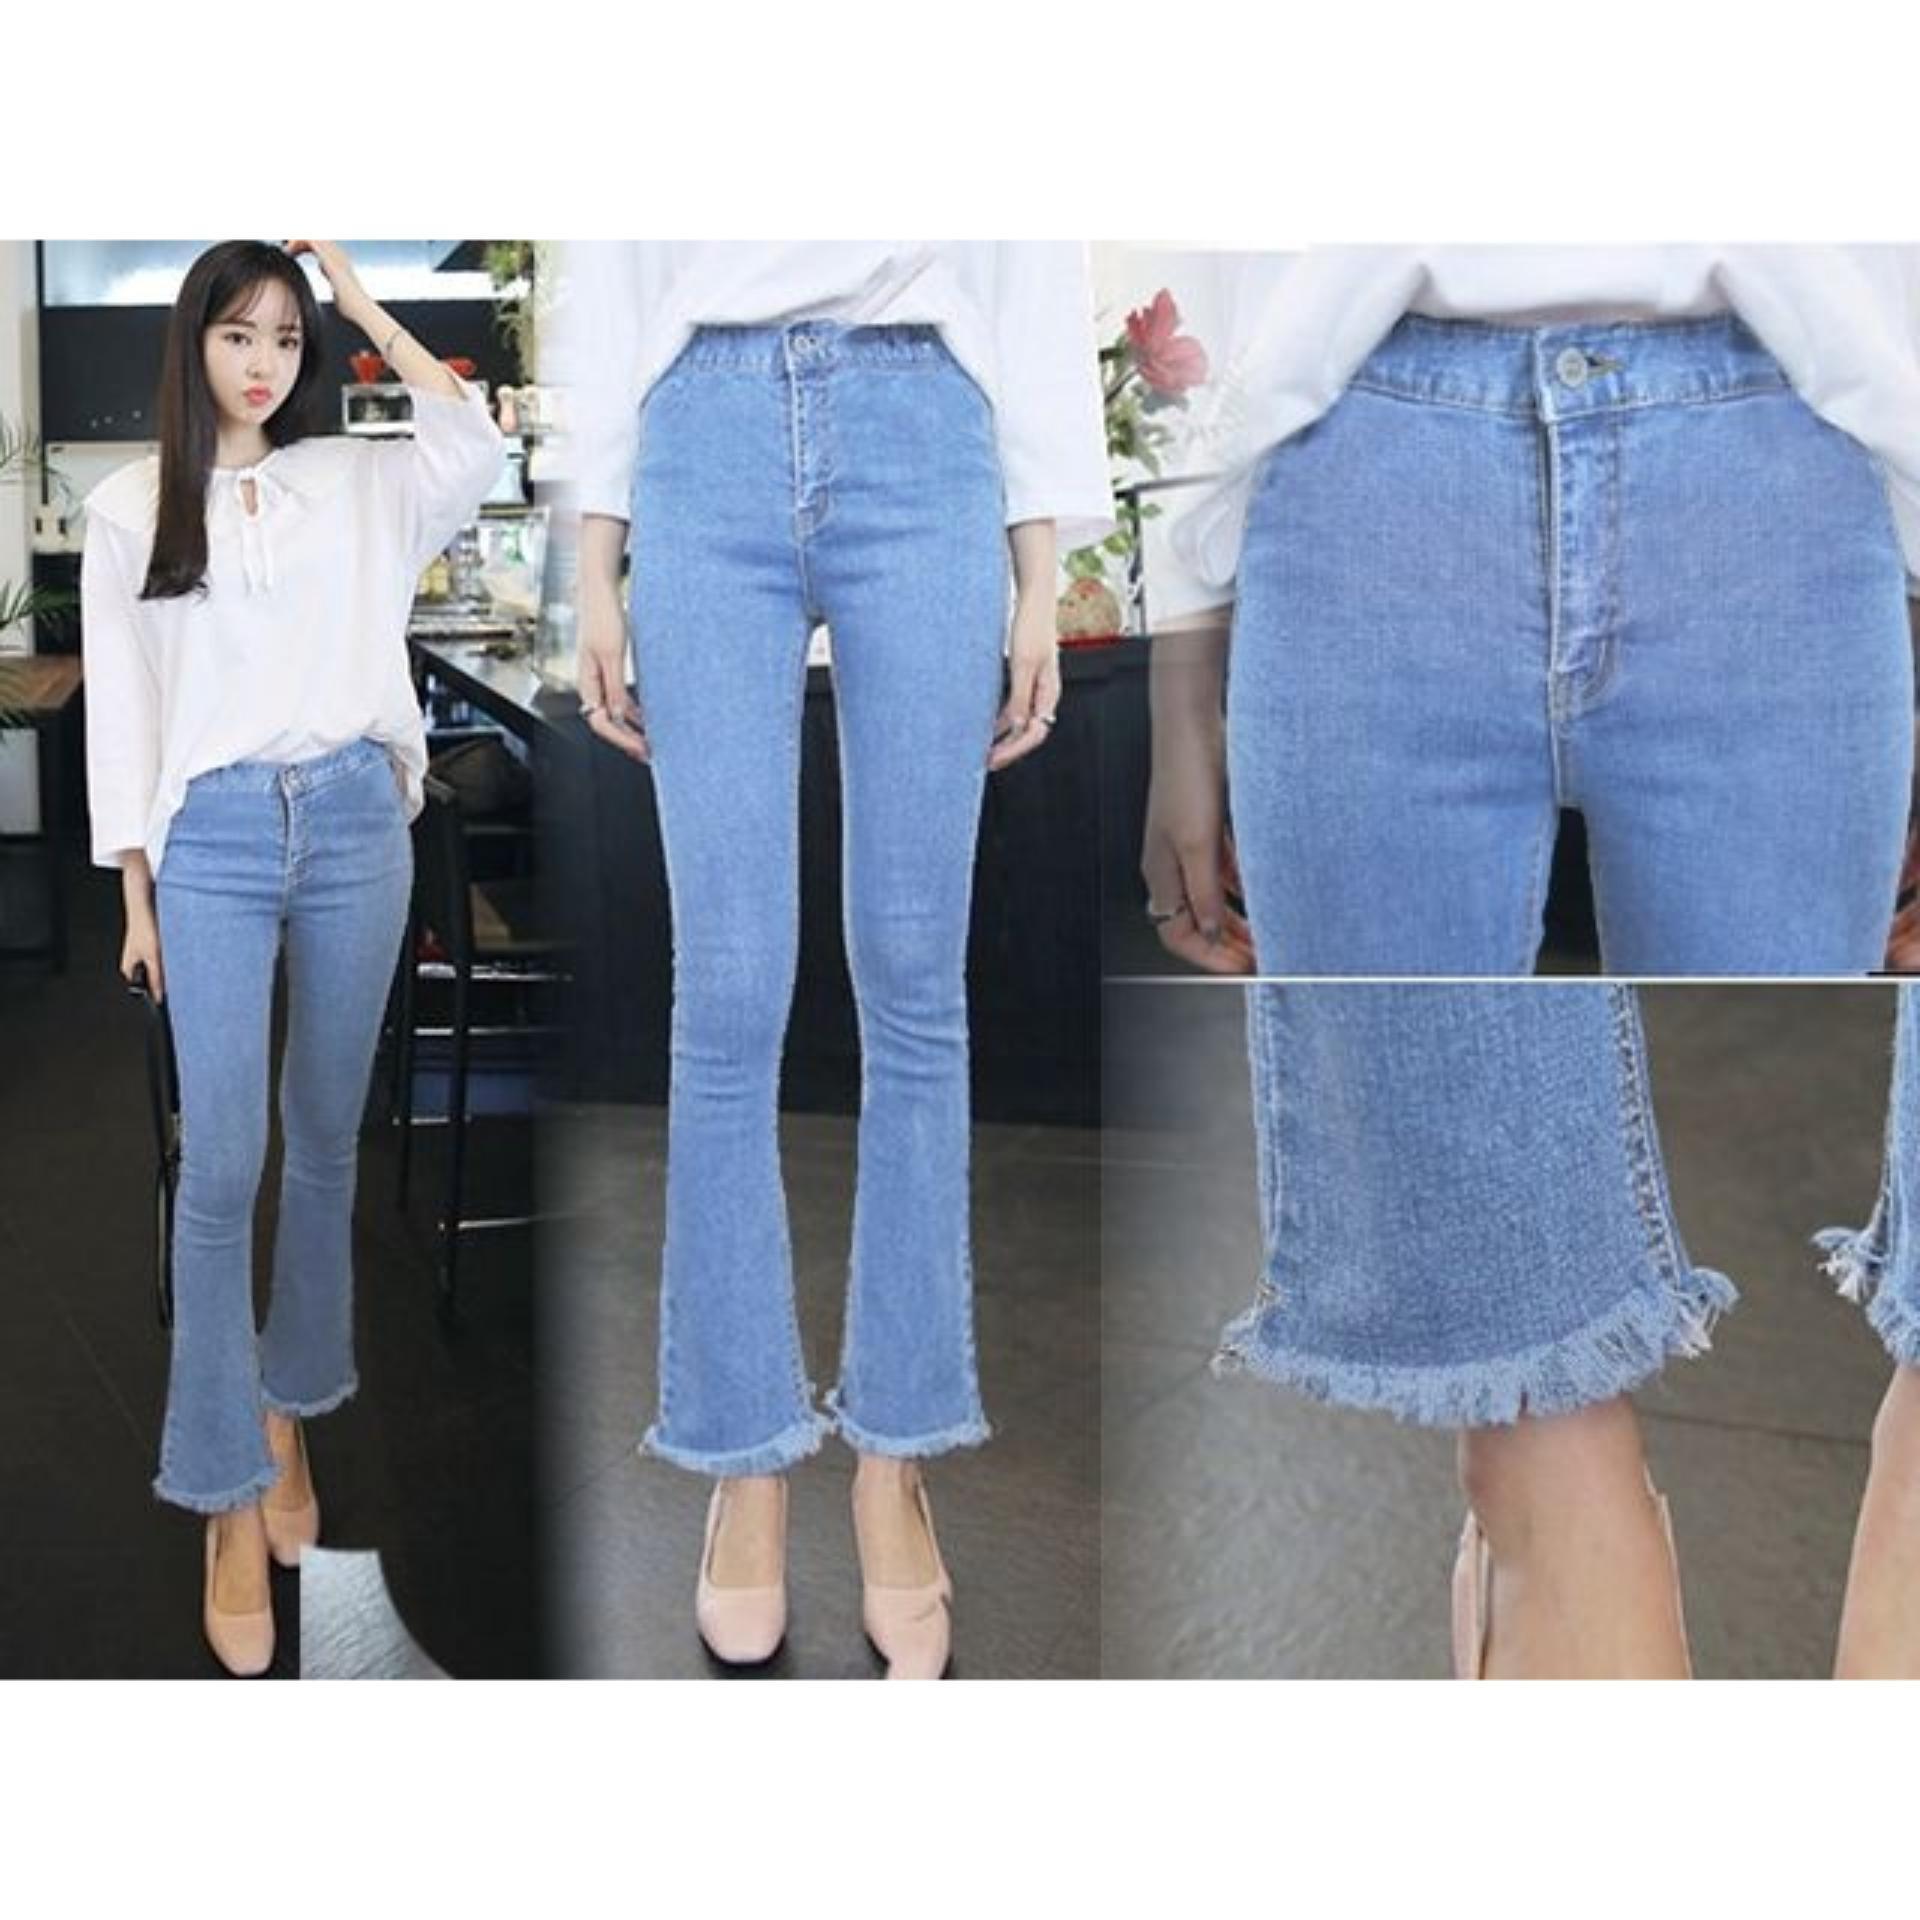 Good Quality Celana Jeans wanita fashionable - HW CUTBRAY